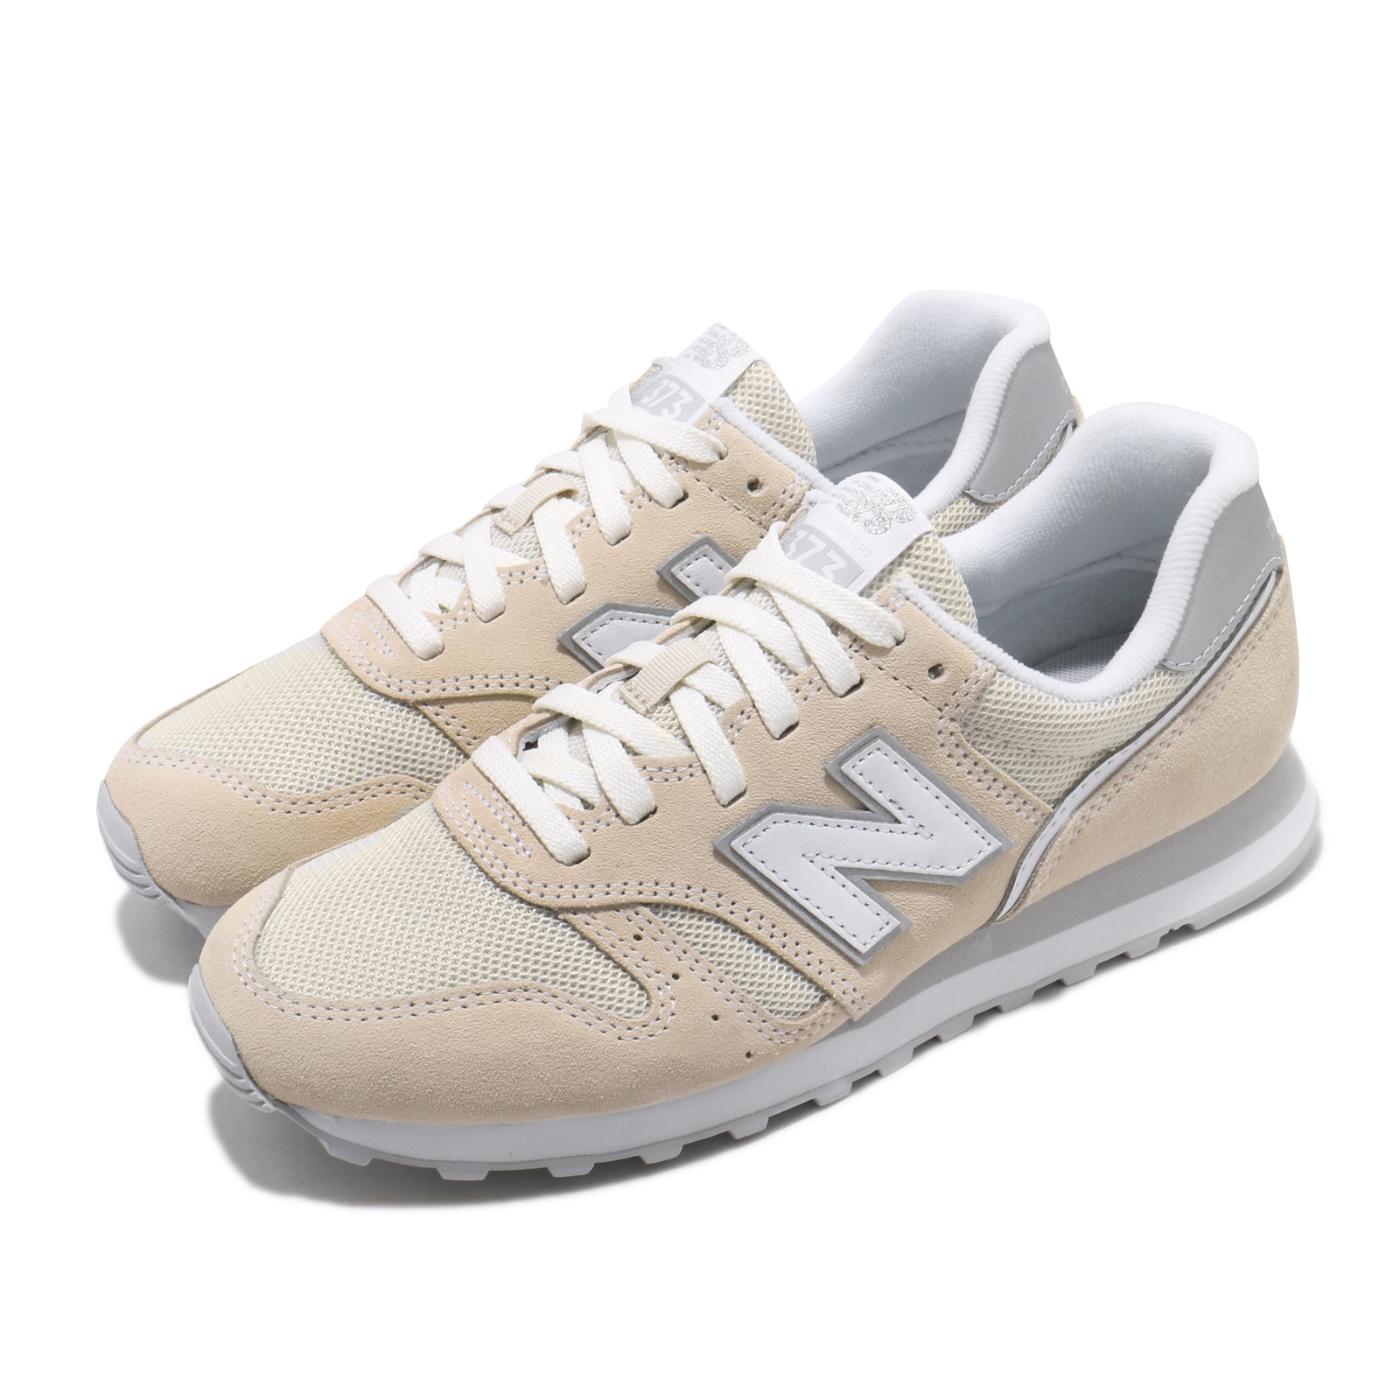 New Balance 休閒鞋 WL373AB2 B 運動 女鞋 紐巴倫 基本款 簡約 麂皮 舒適 穿搭 米白 銀 WL373AB2B